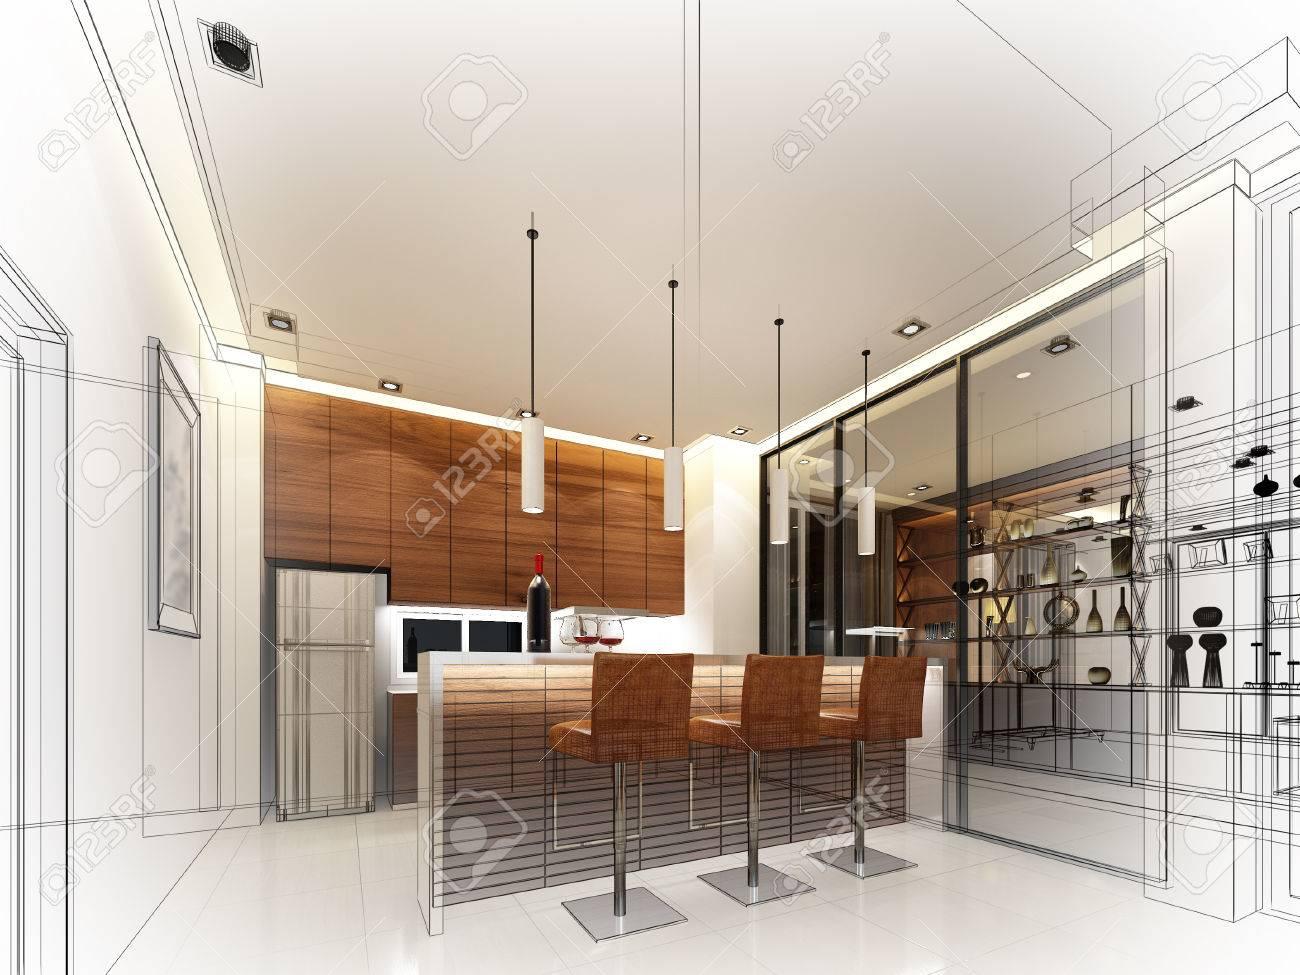 abstract sketch design of interior kitchen - 50113432